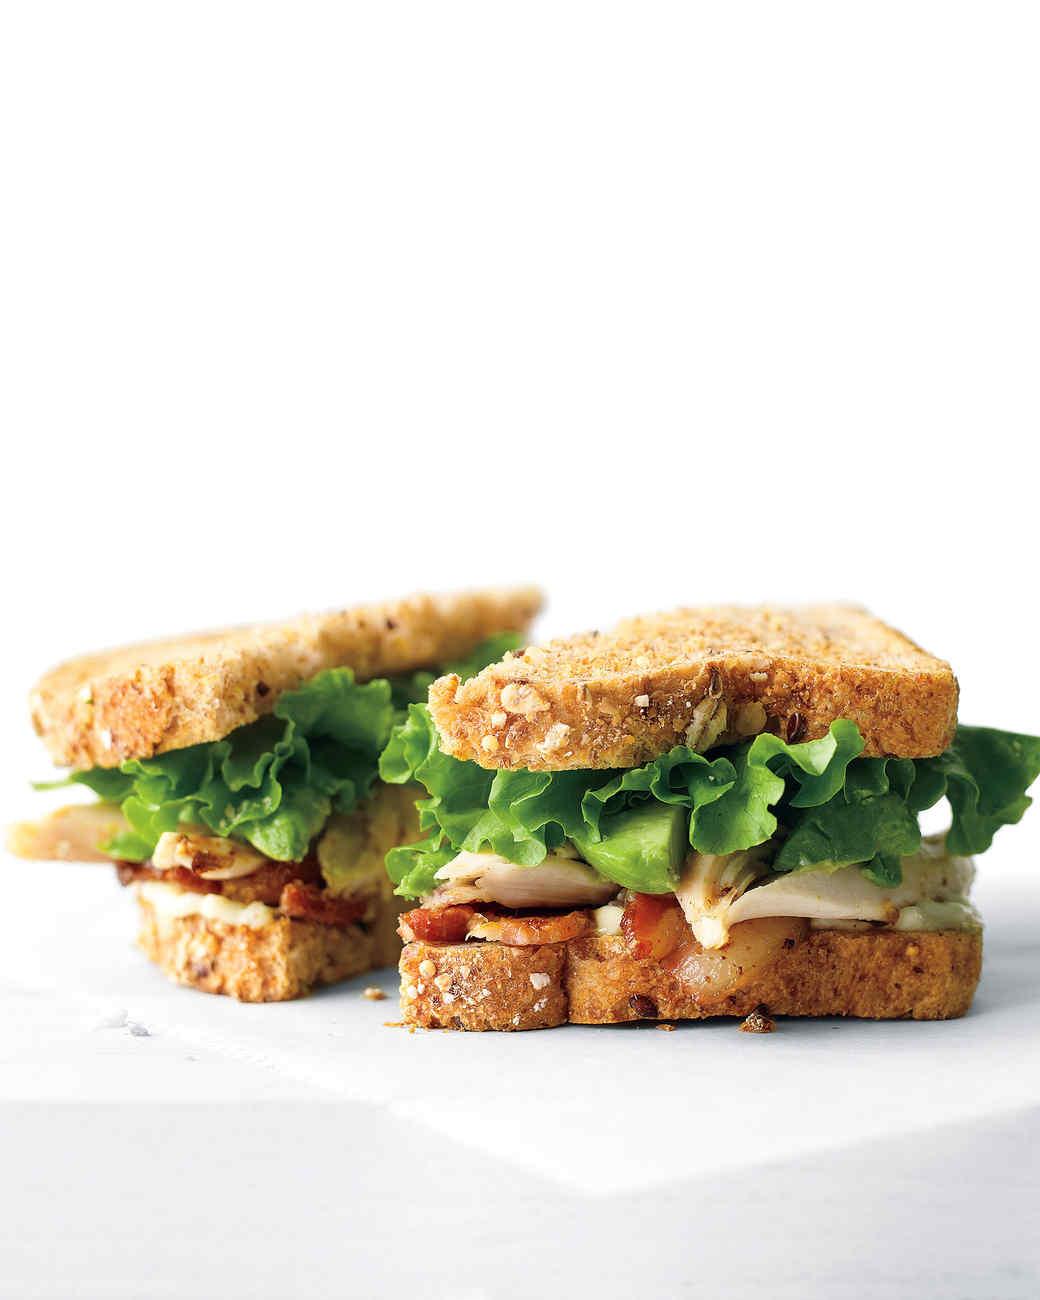 Chicken, Avocado, and Bacon Sandwich